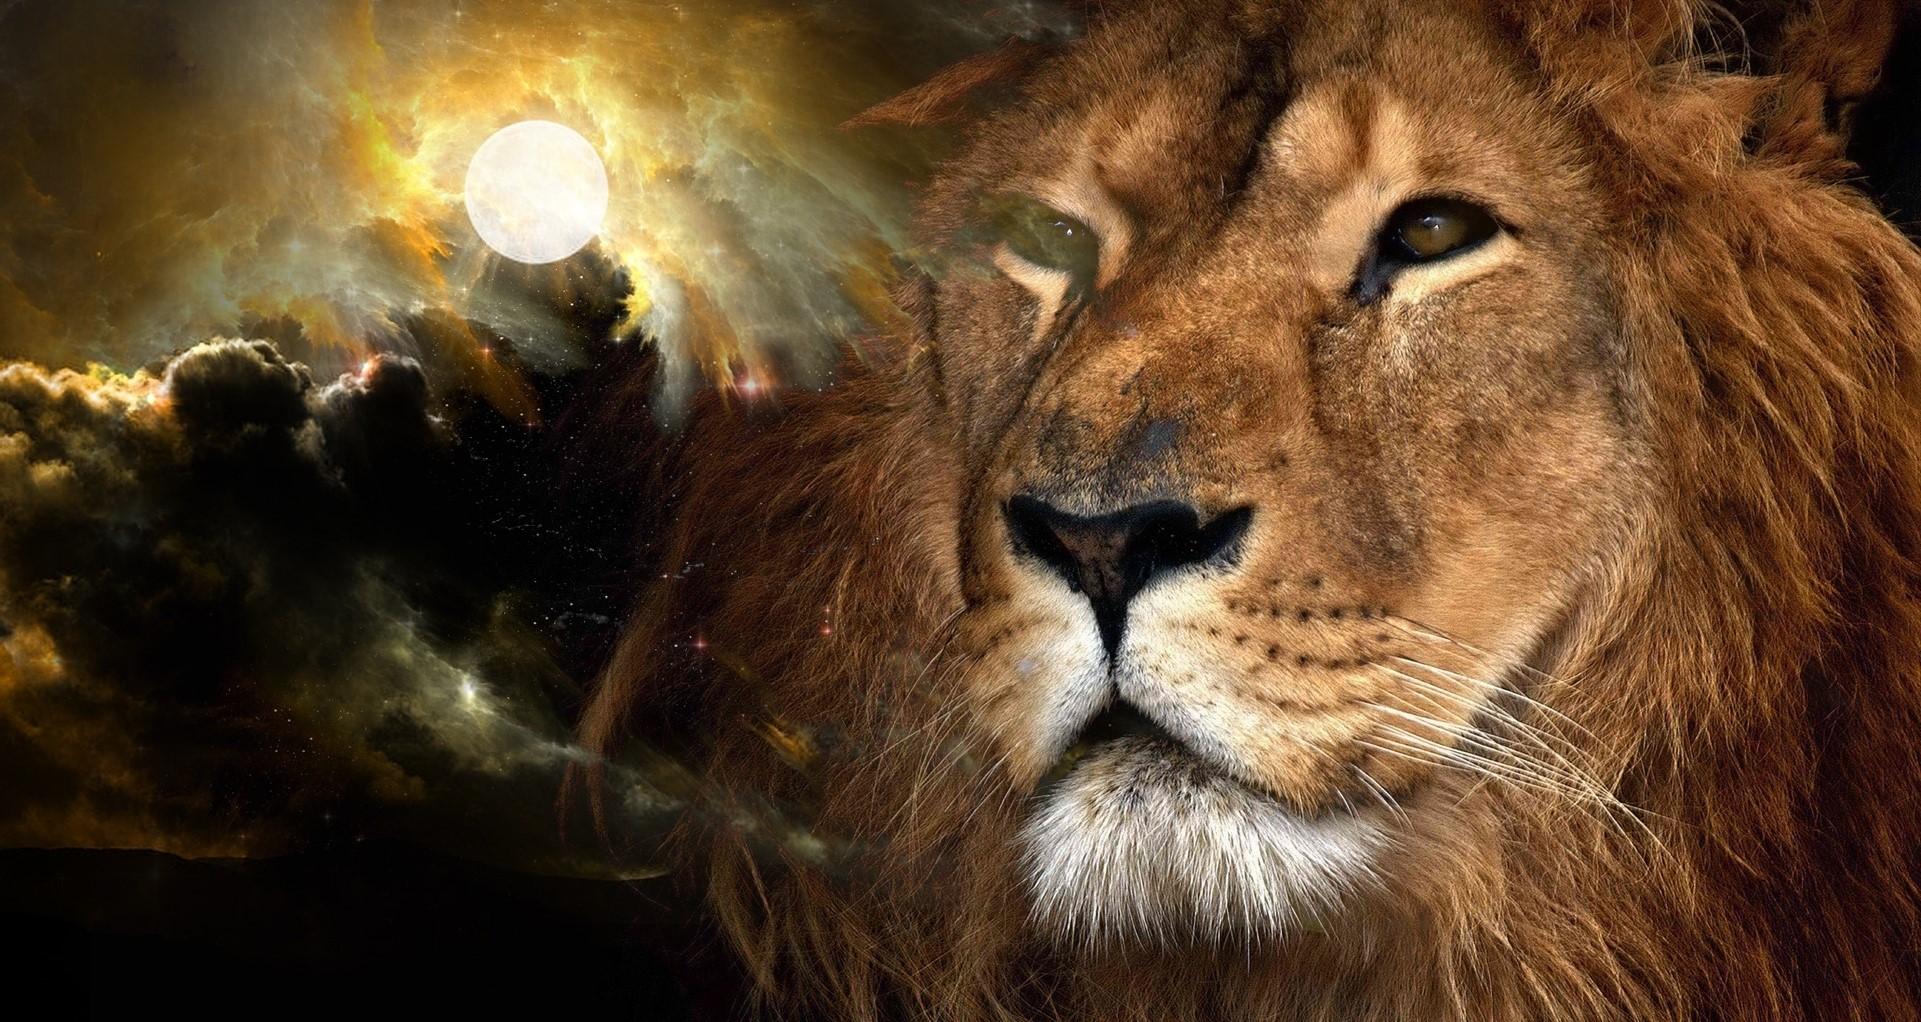 Horoscop 8 februarie 2020. Se apropie o schimbare radicală